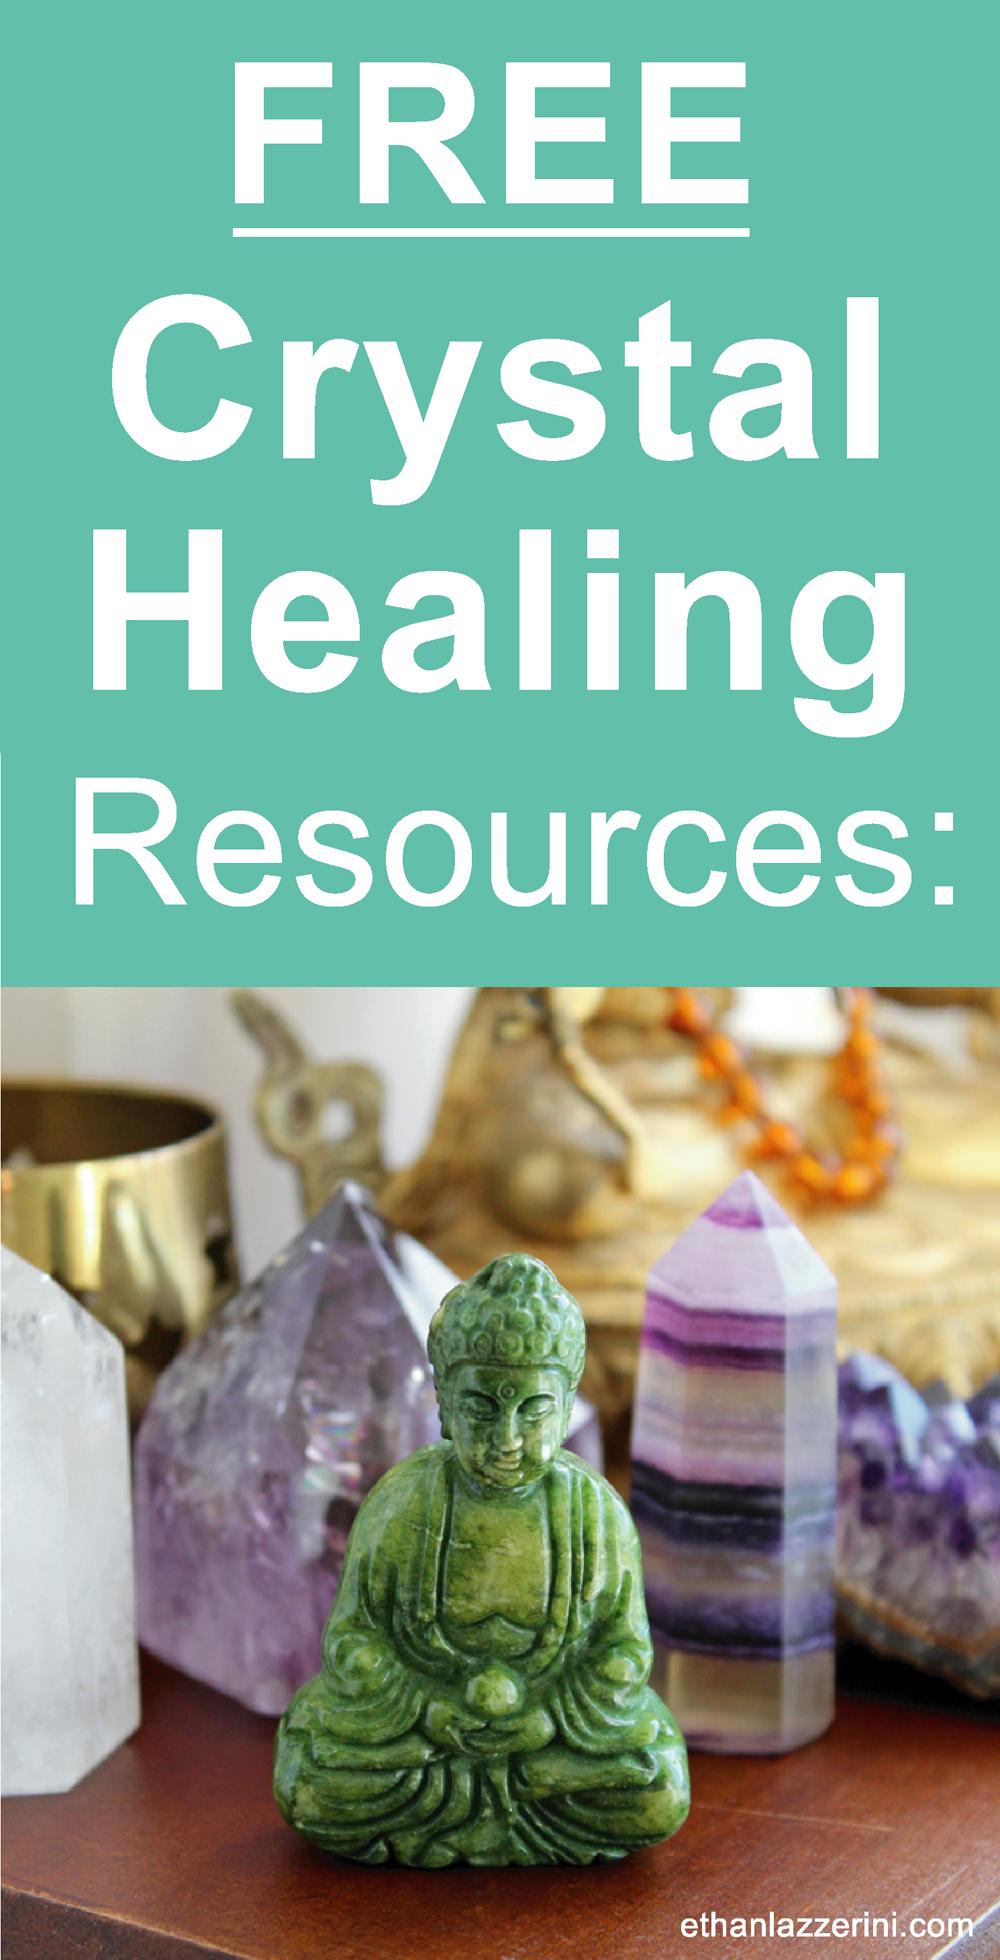 Free Crystal Healing Resources at ethanlazzerini.com